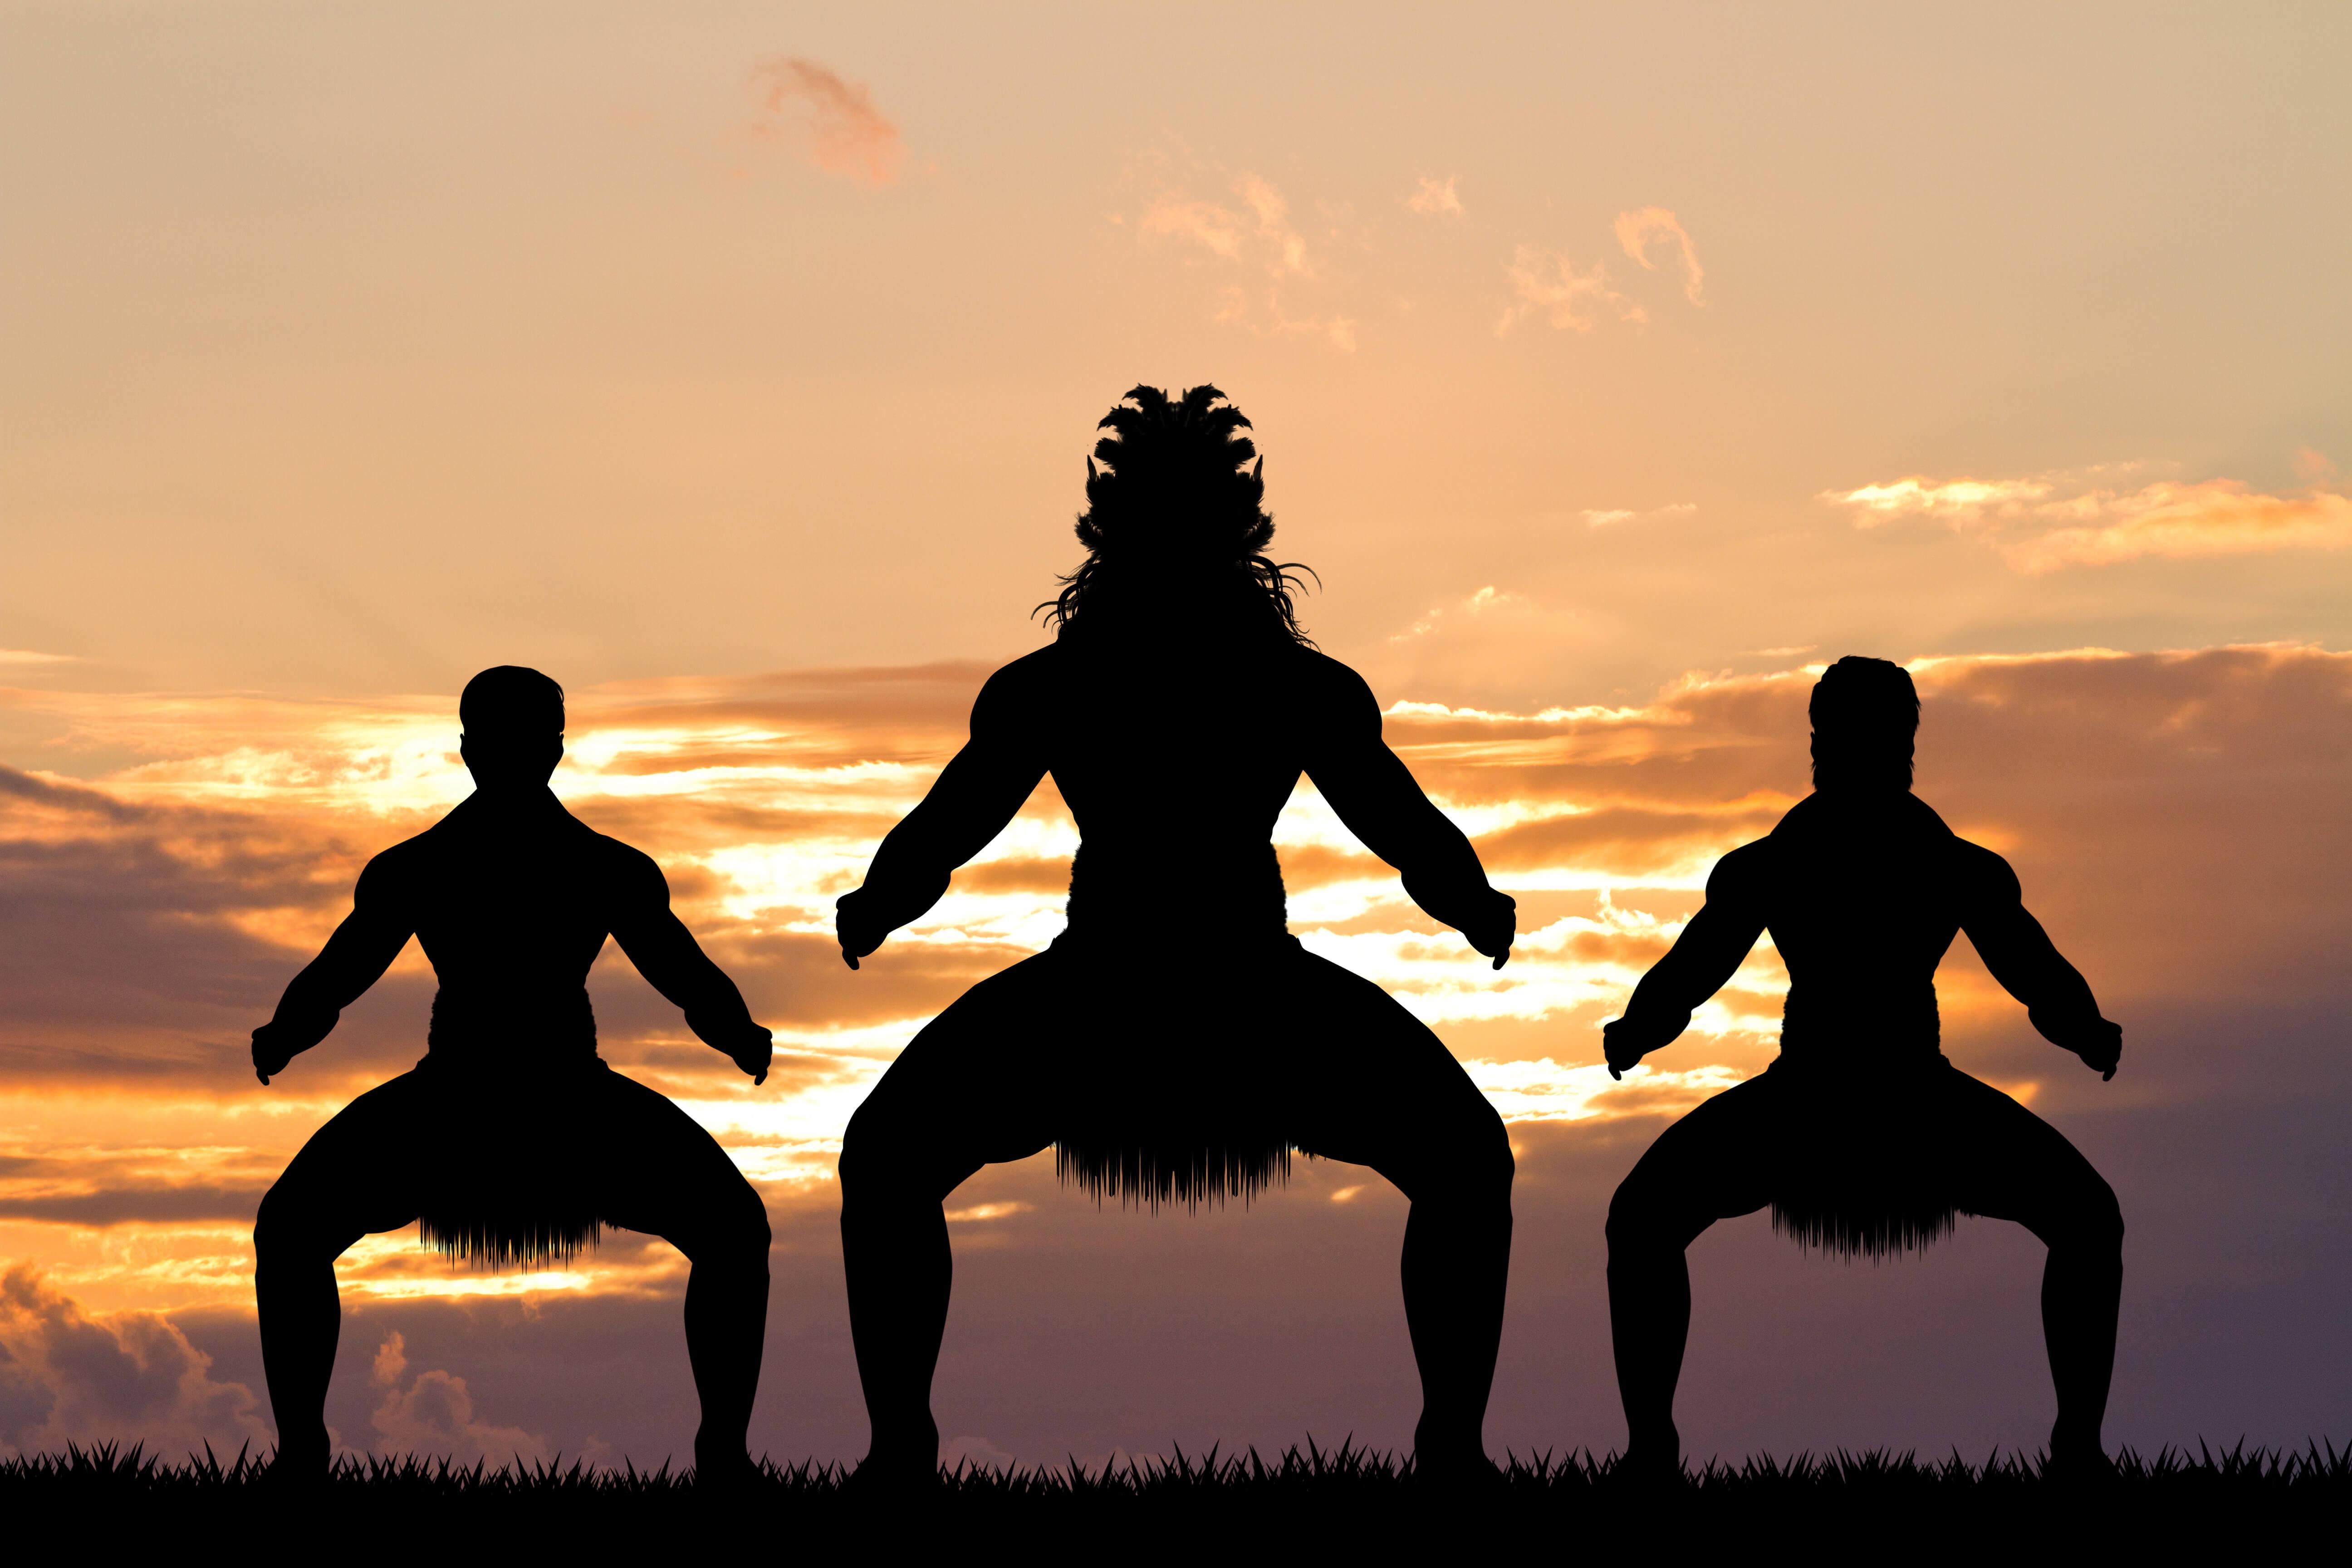 Maori Dance at Sunset in New Zealand